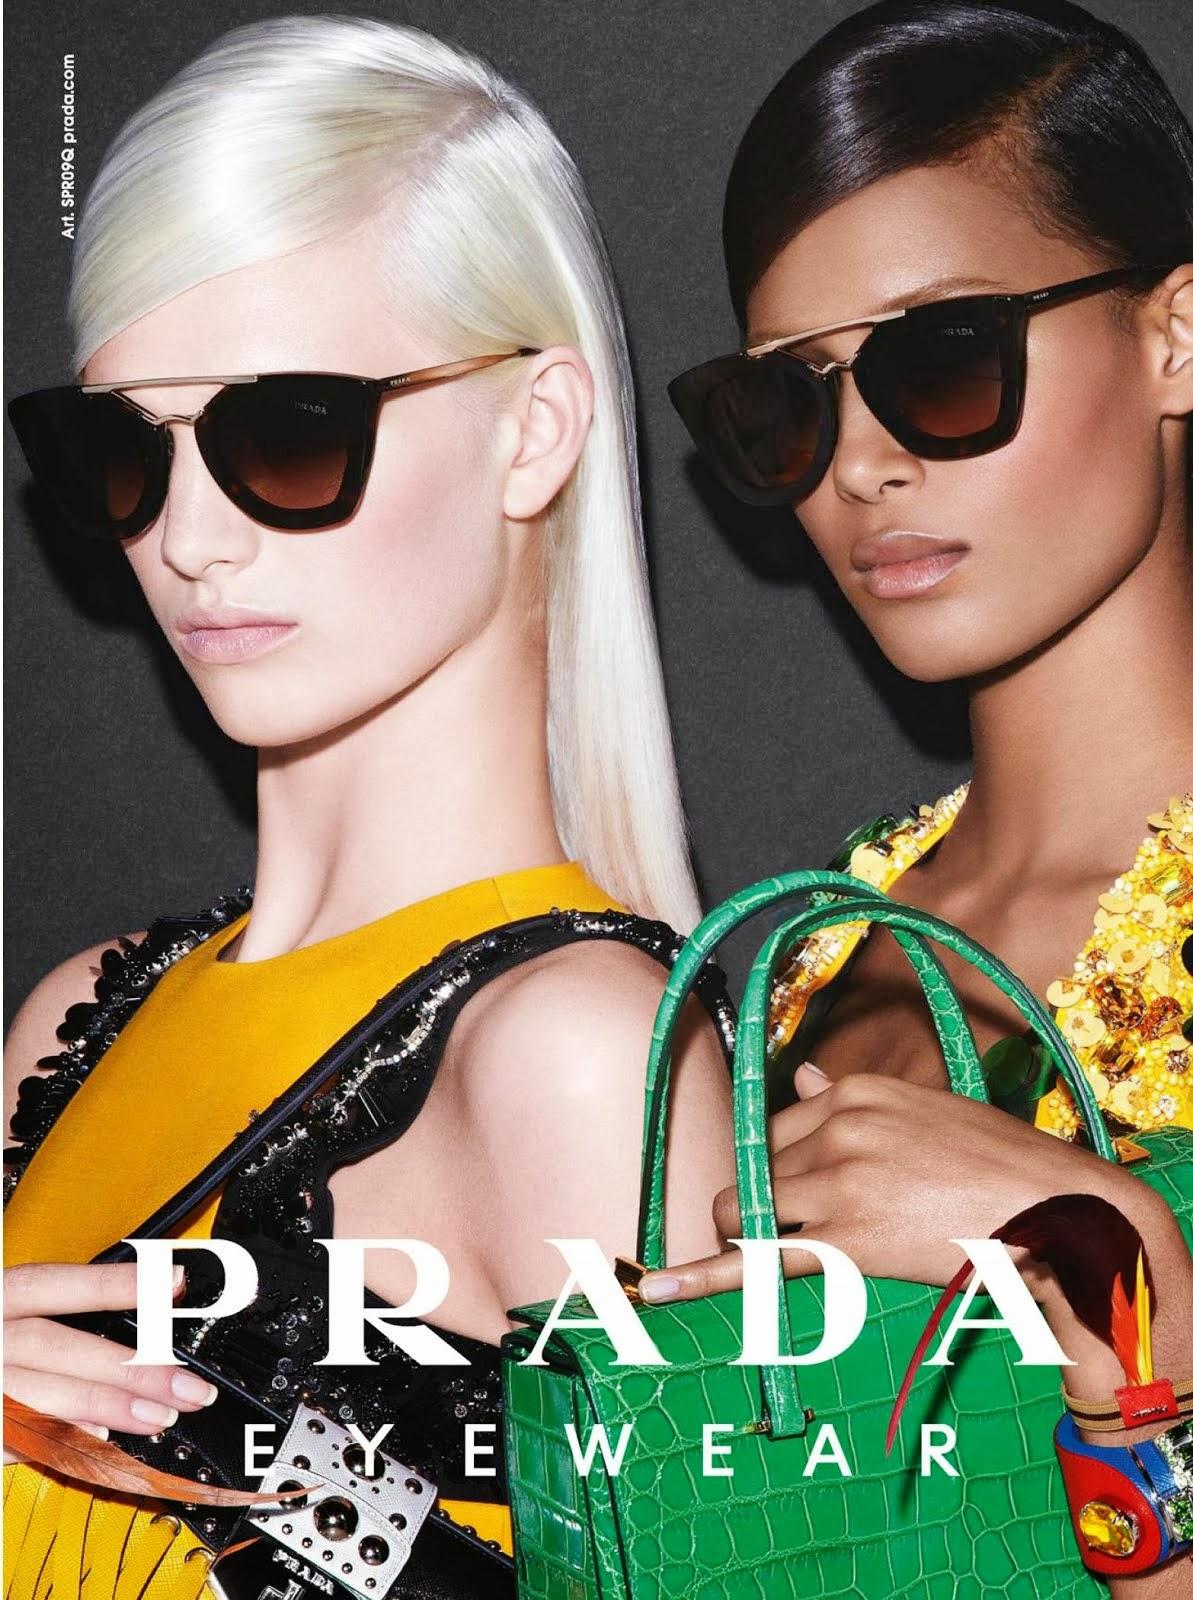 Prada Eyewear SS 2014